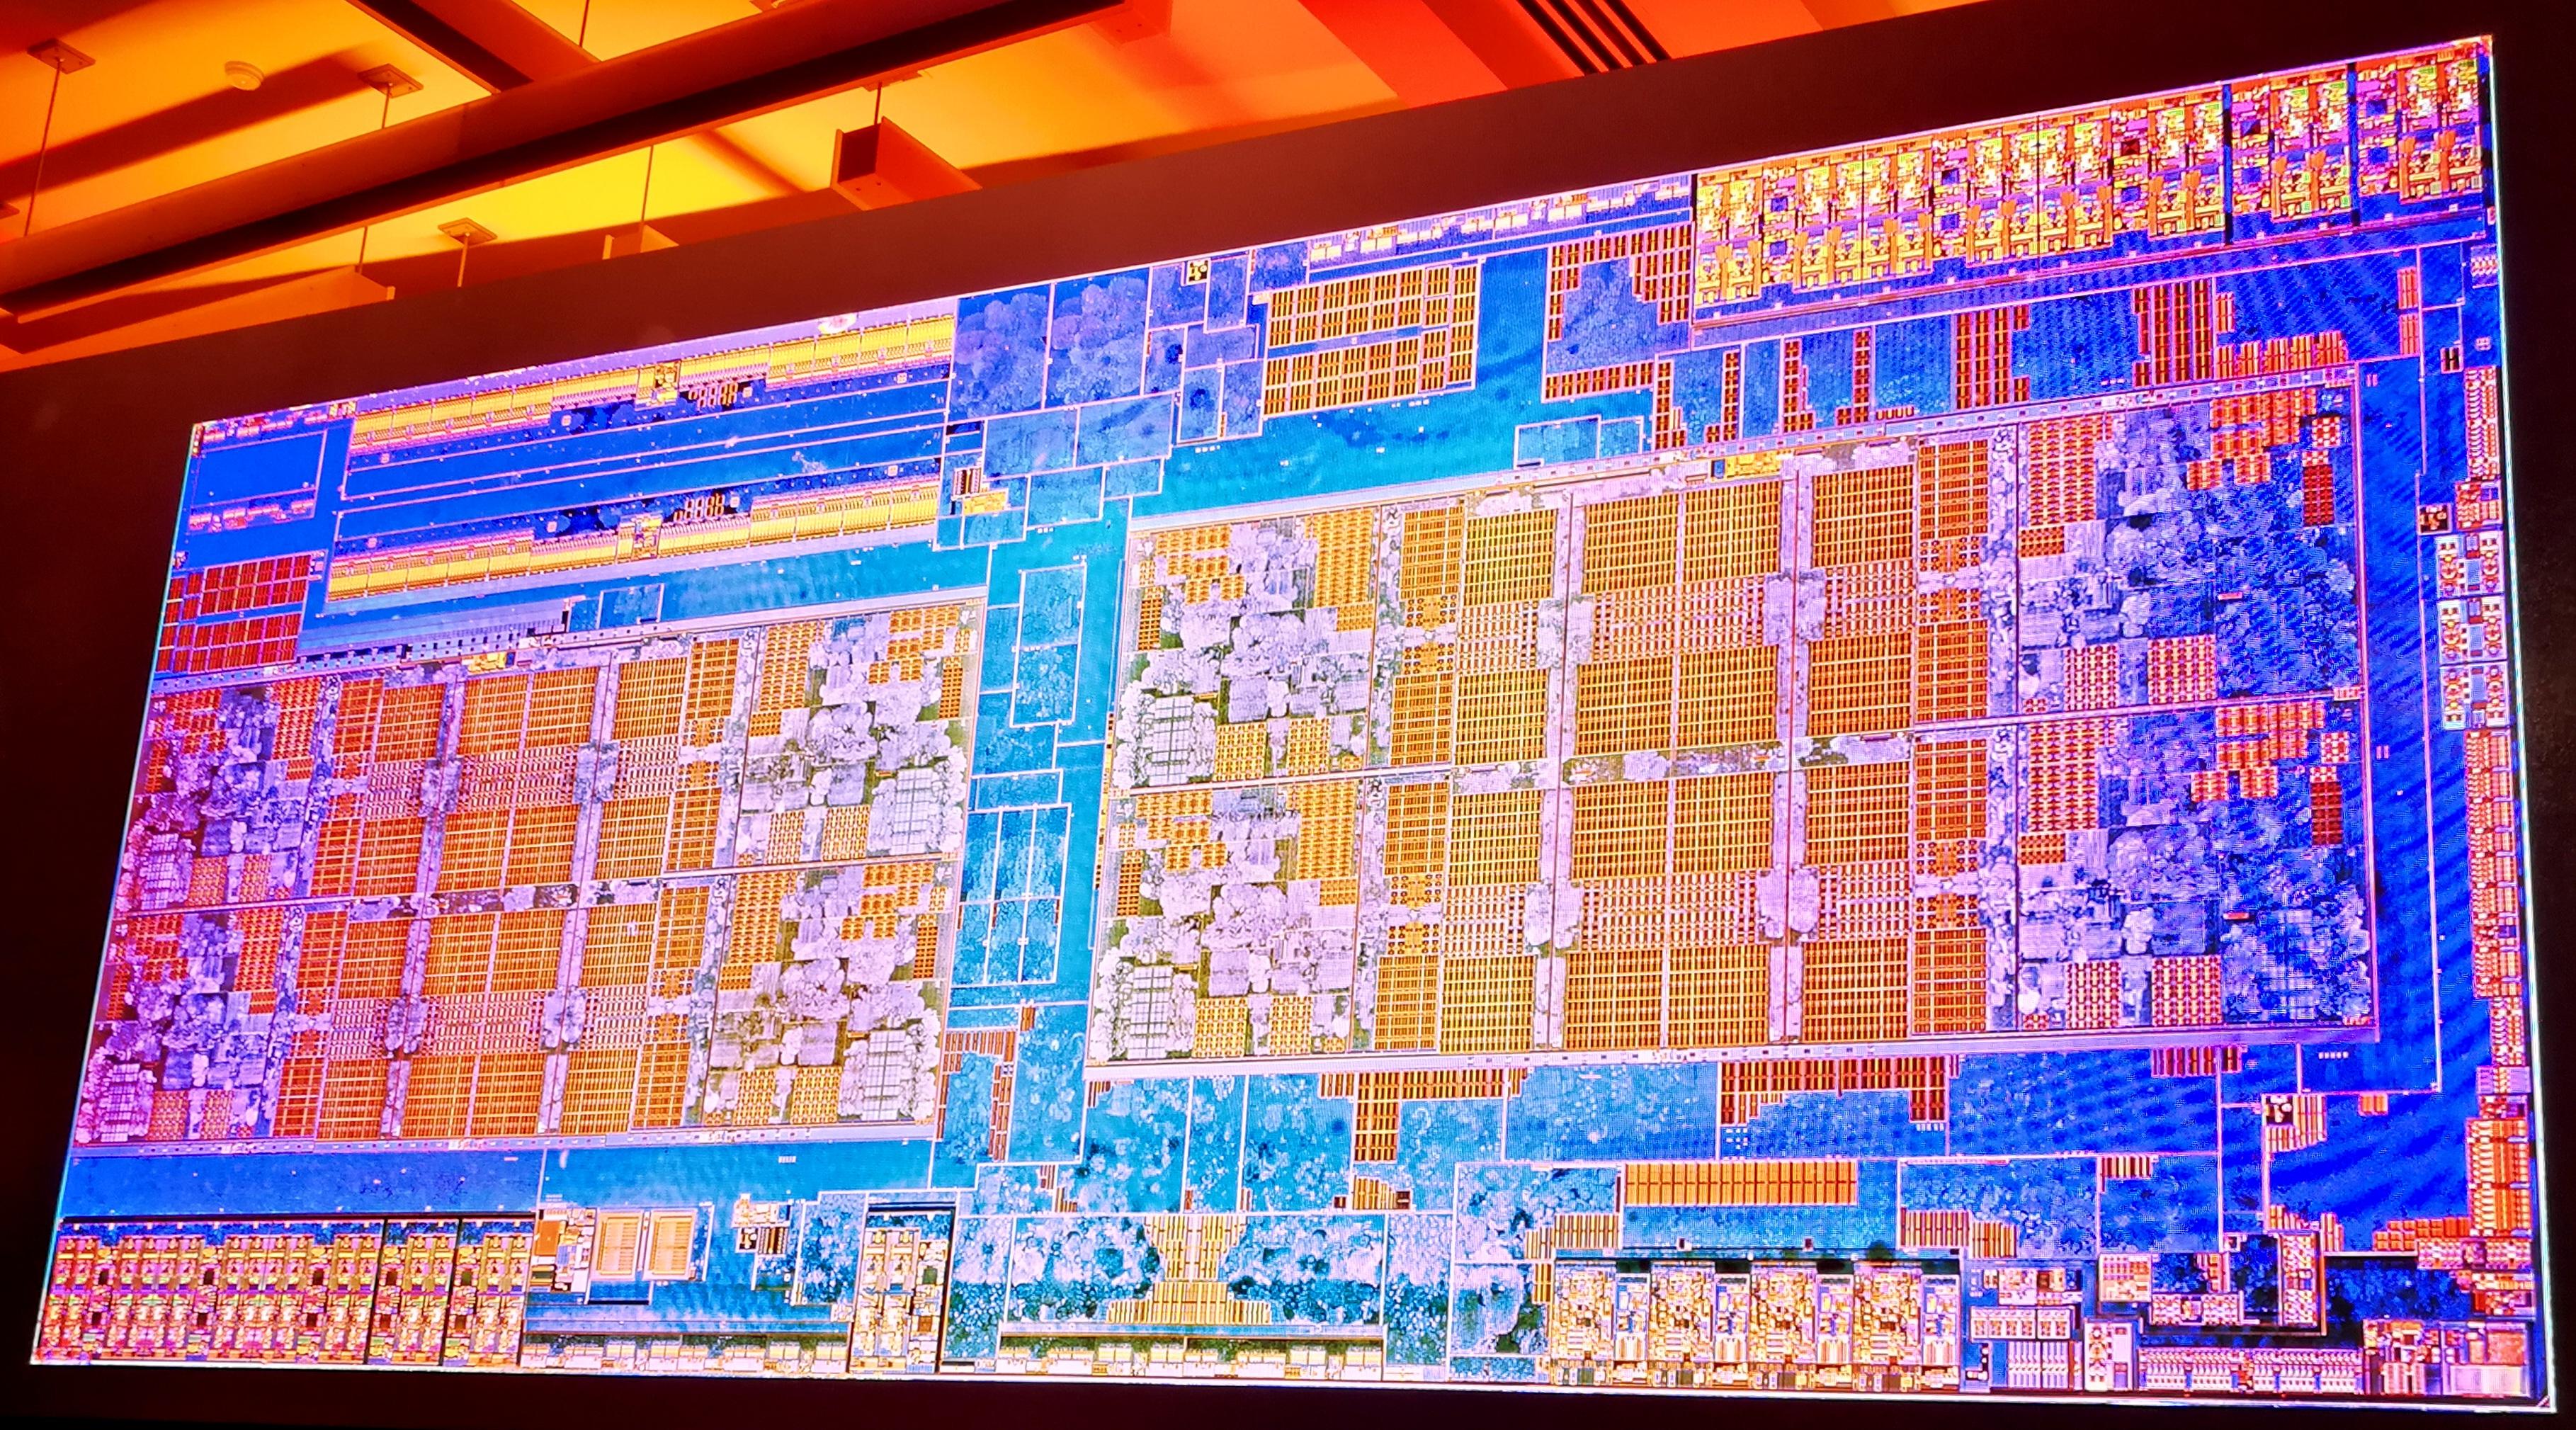 Ryzen 5, Core Allocation, and Power - The AMD Ryzen 5 1600X vs Core